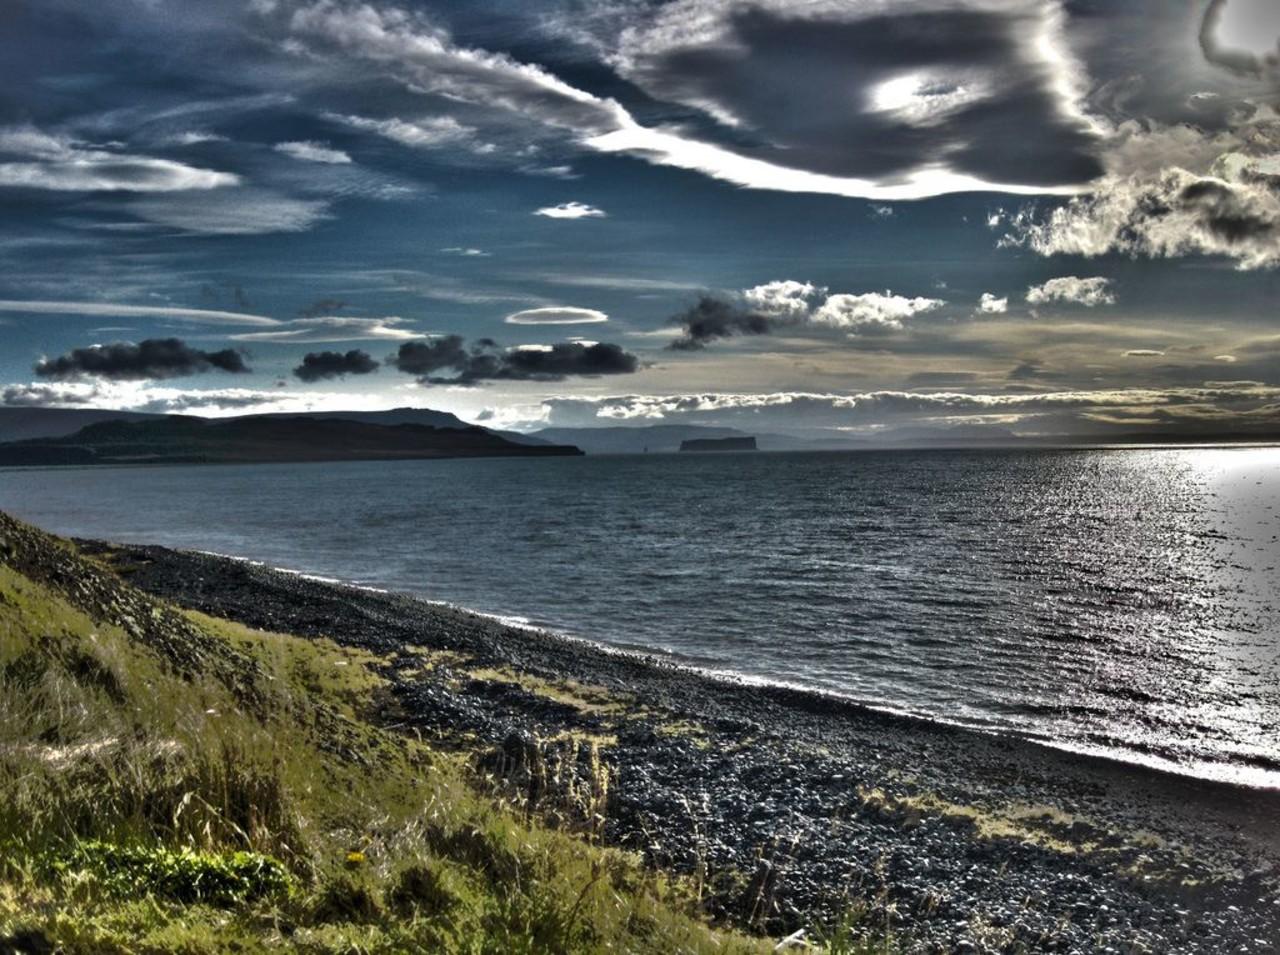 Beautiful black beach with mountains in the distance, Þórðarhöfði